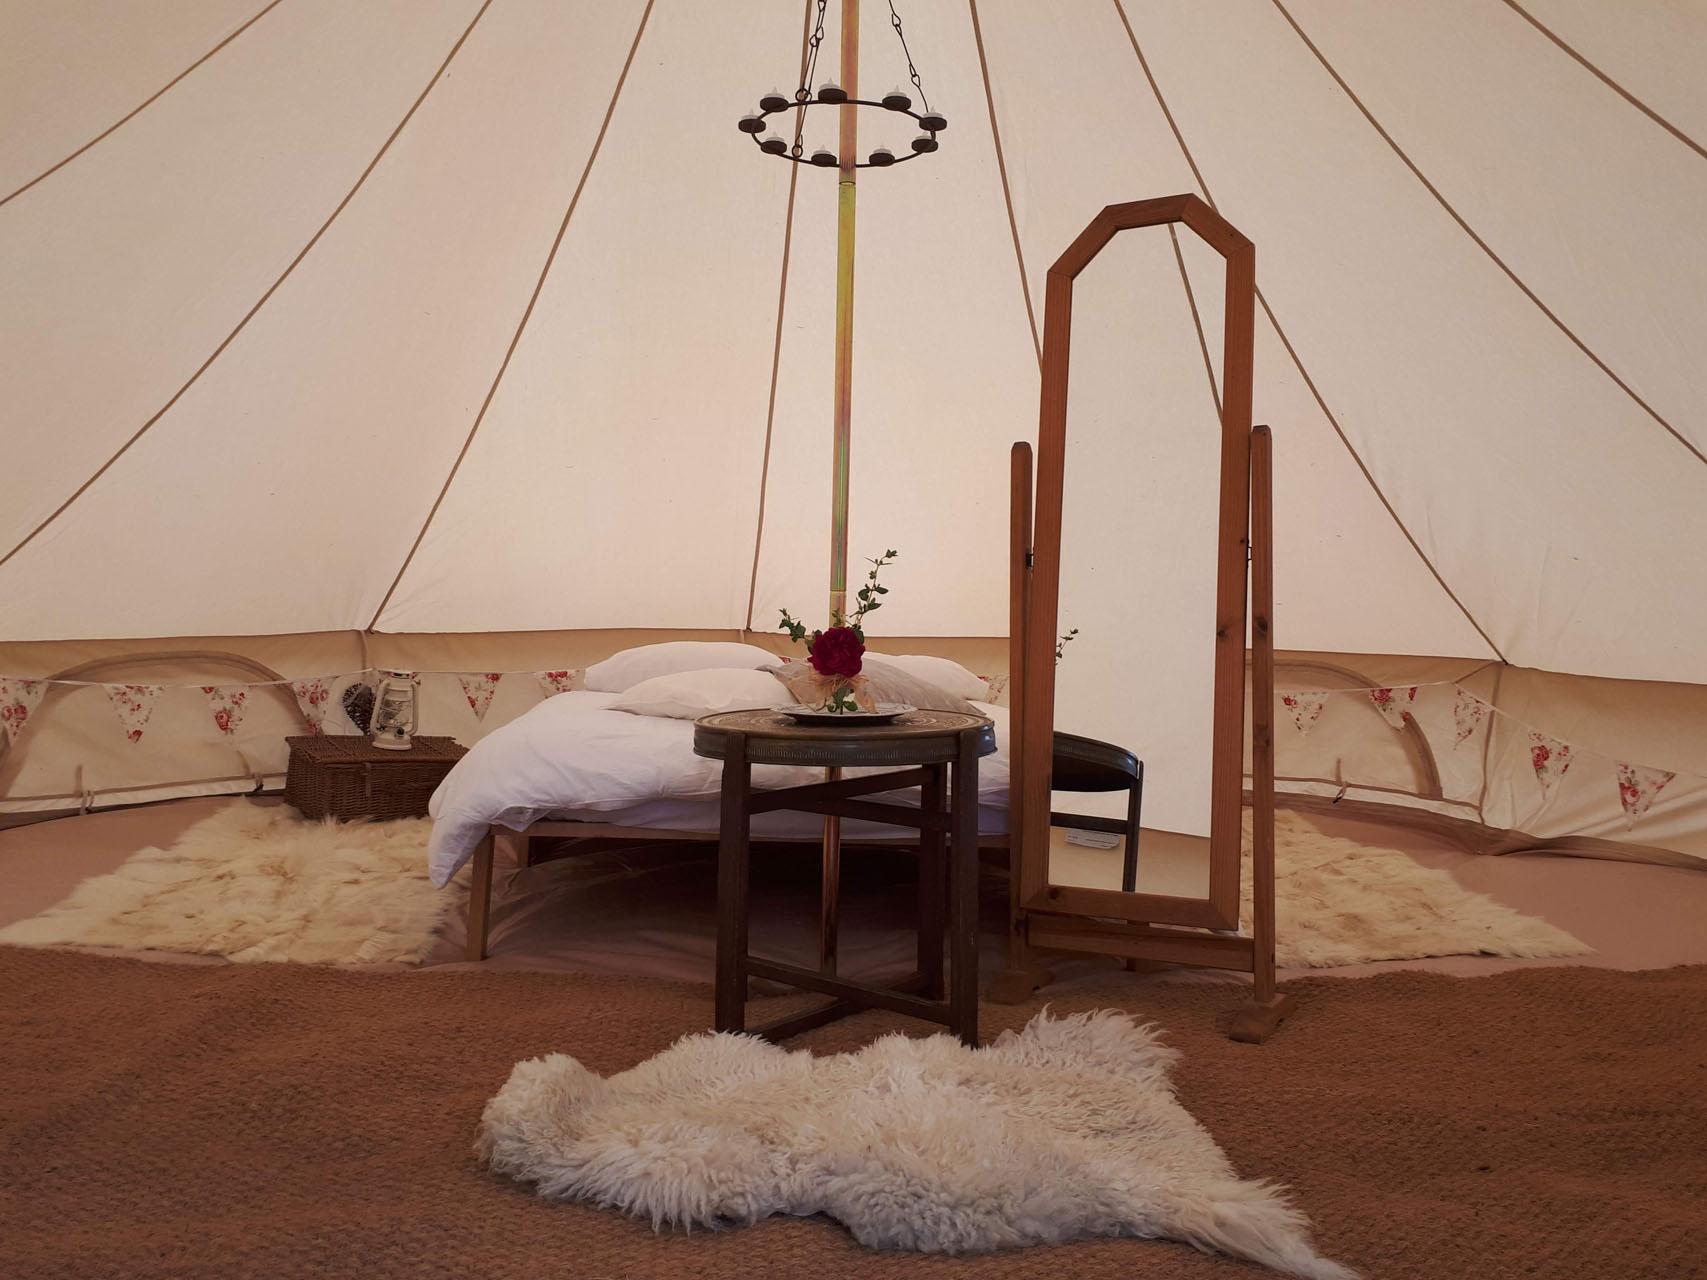 bridal_bell_tent